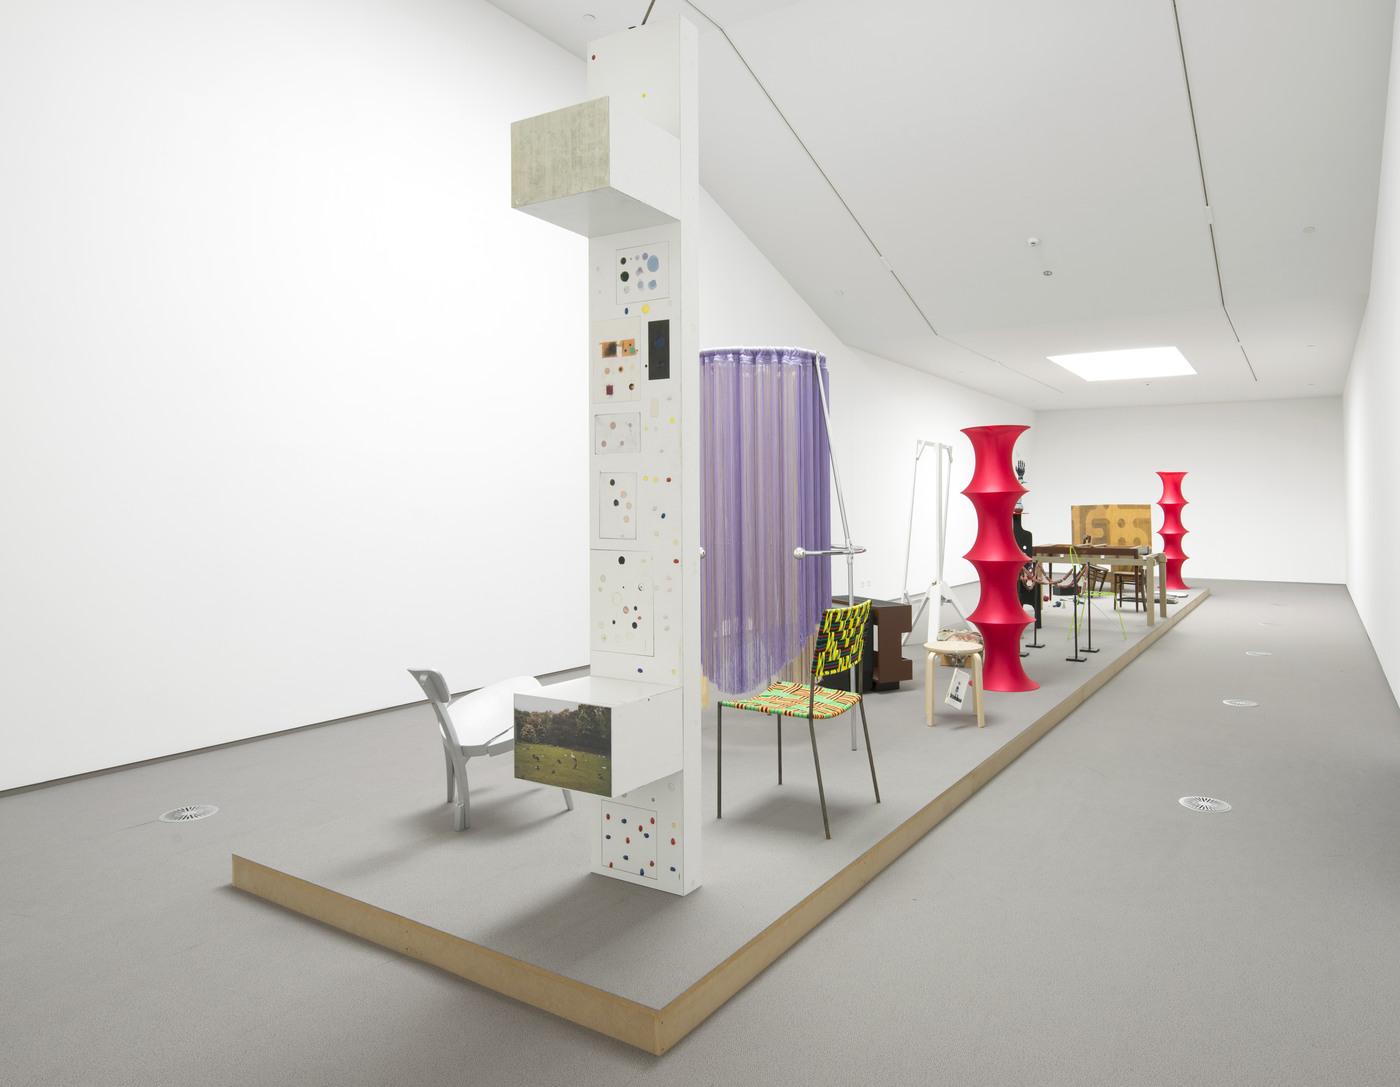 Furniture.Sculpture., Art Center Hugo Voeten, May 2016_52